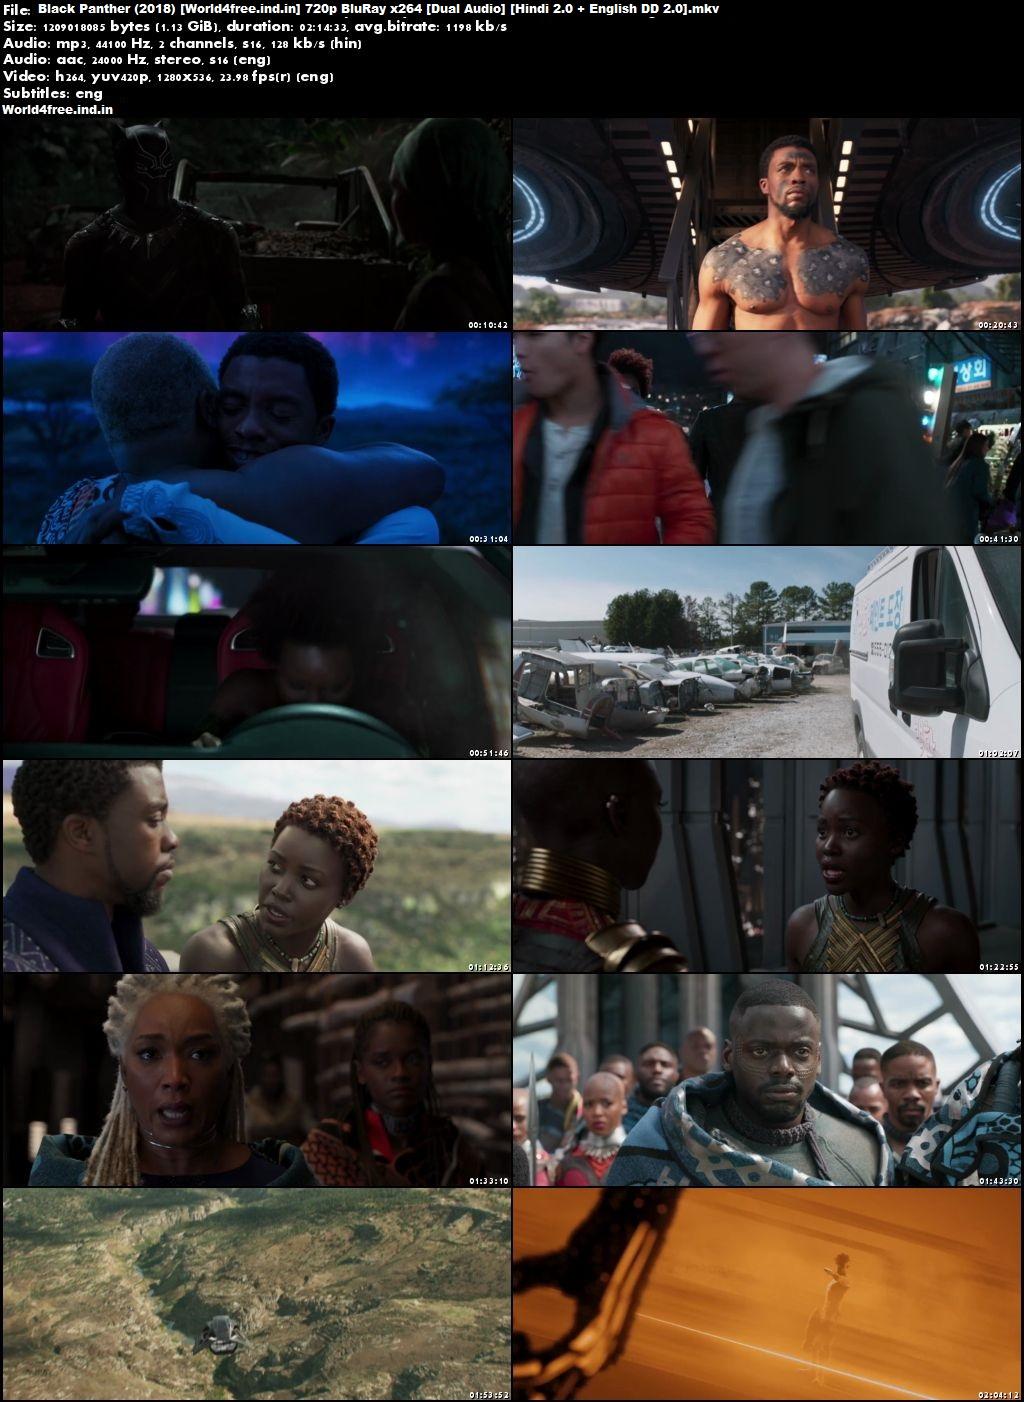 Black Panther 2018 worldfree4u Full Hindi Movie Download Dual Audio HD